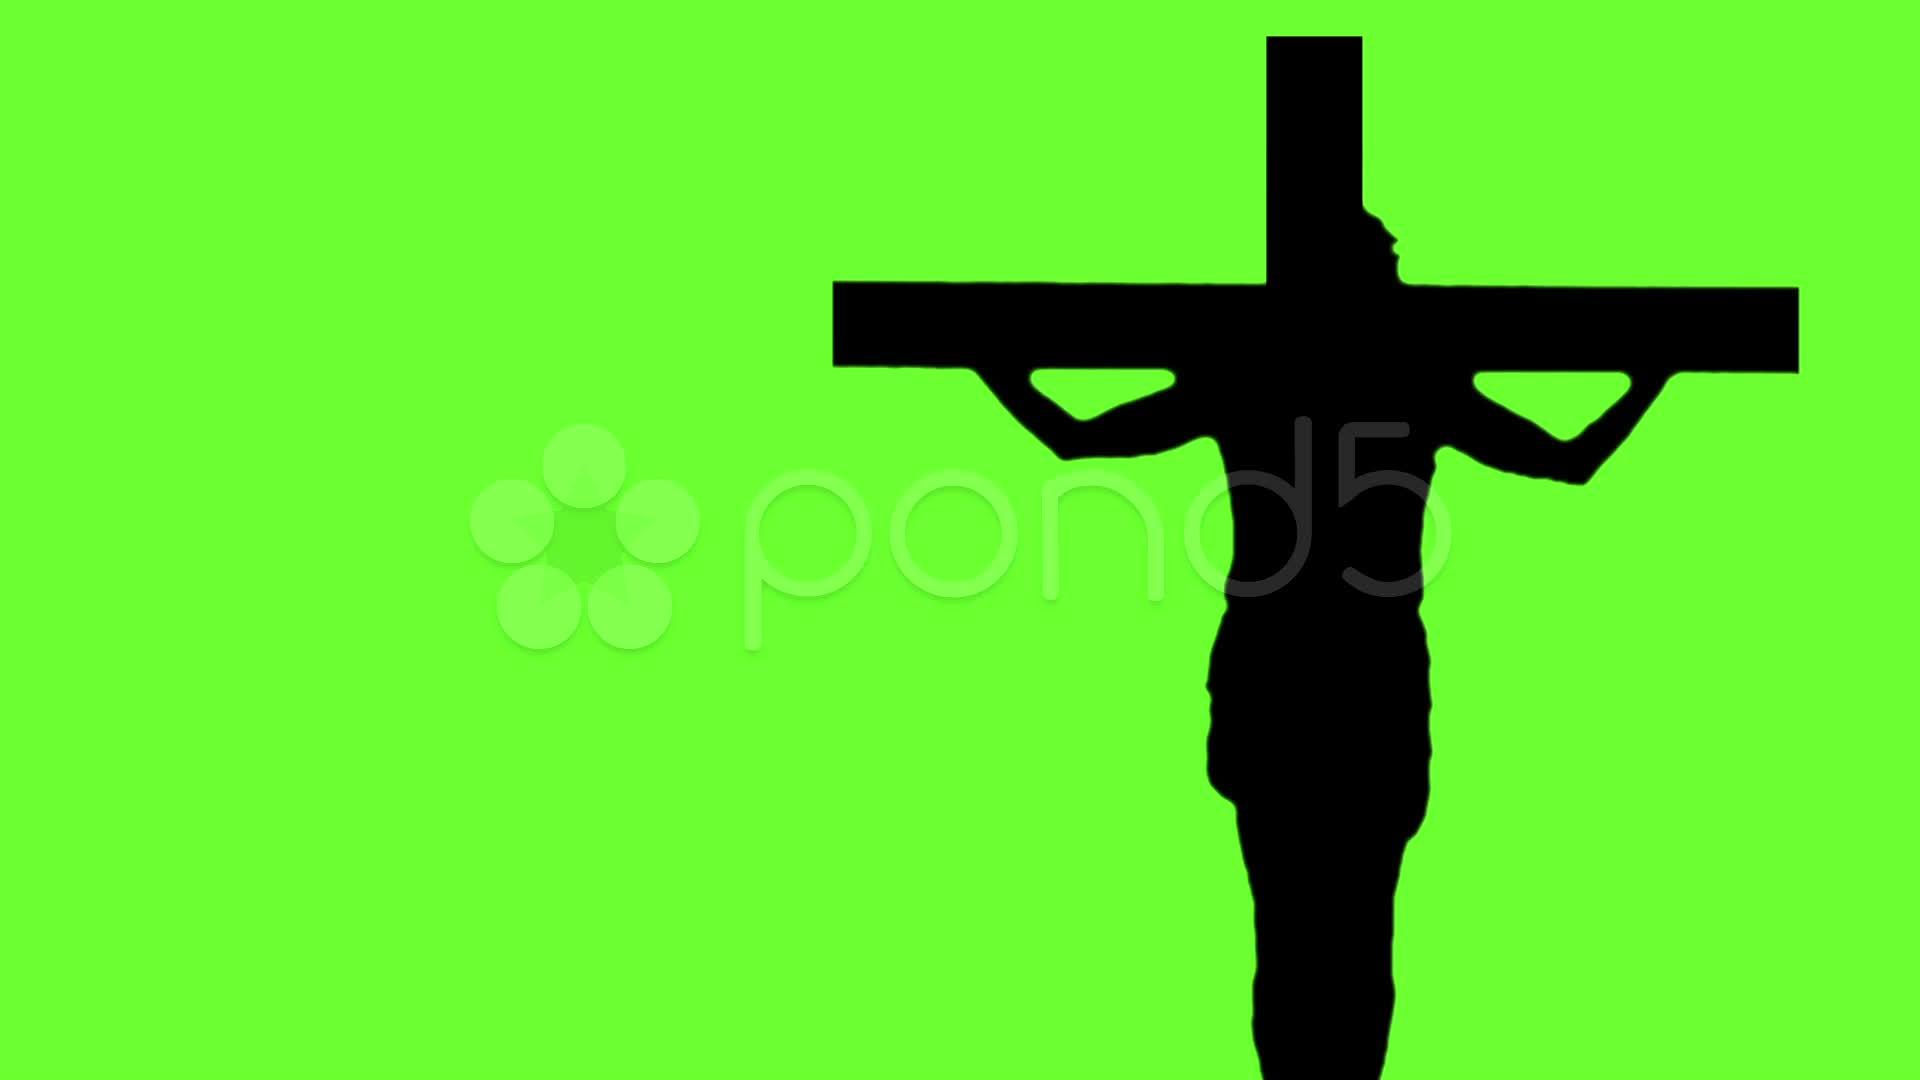 1920x1080 Jesus Cross Medium Green Screen ~ Stock Footage